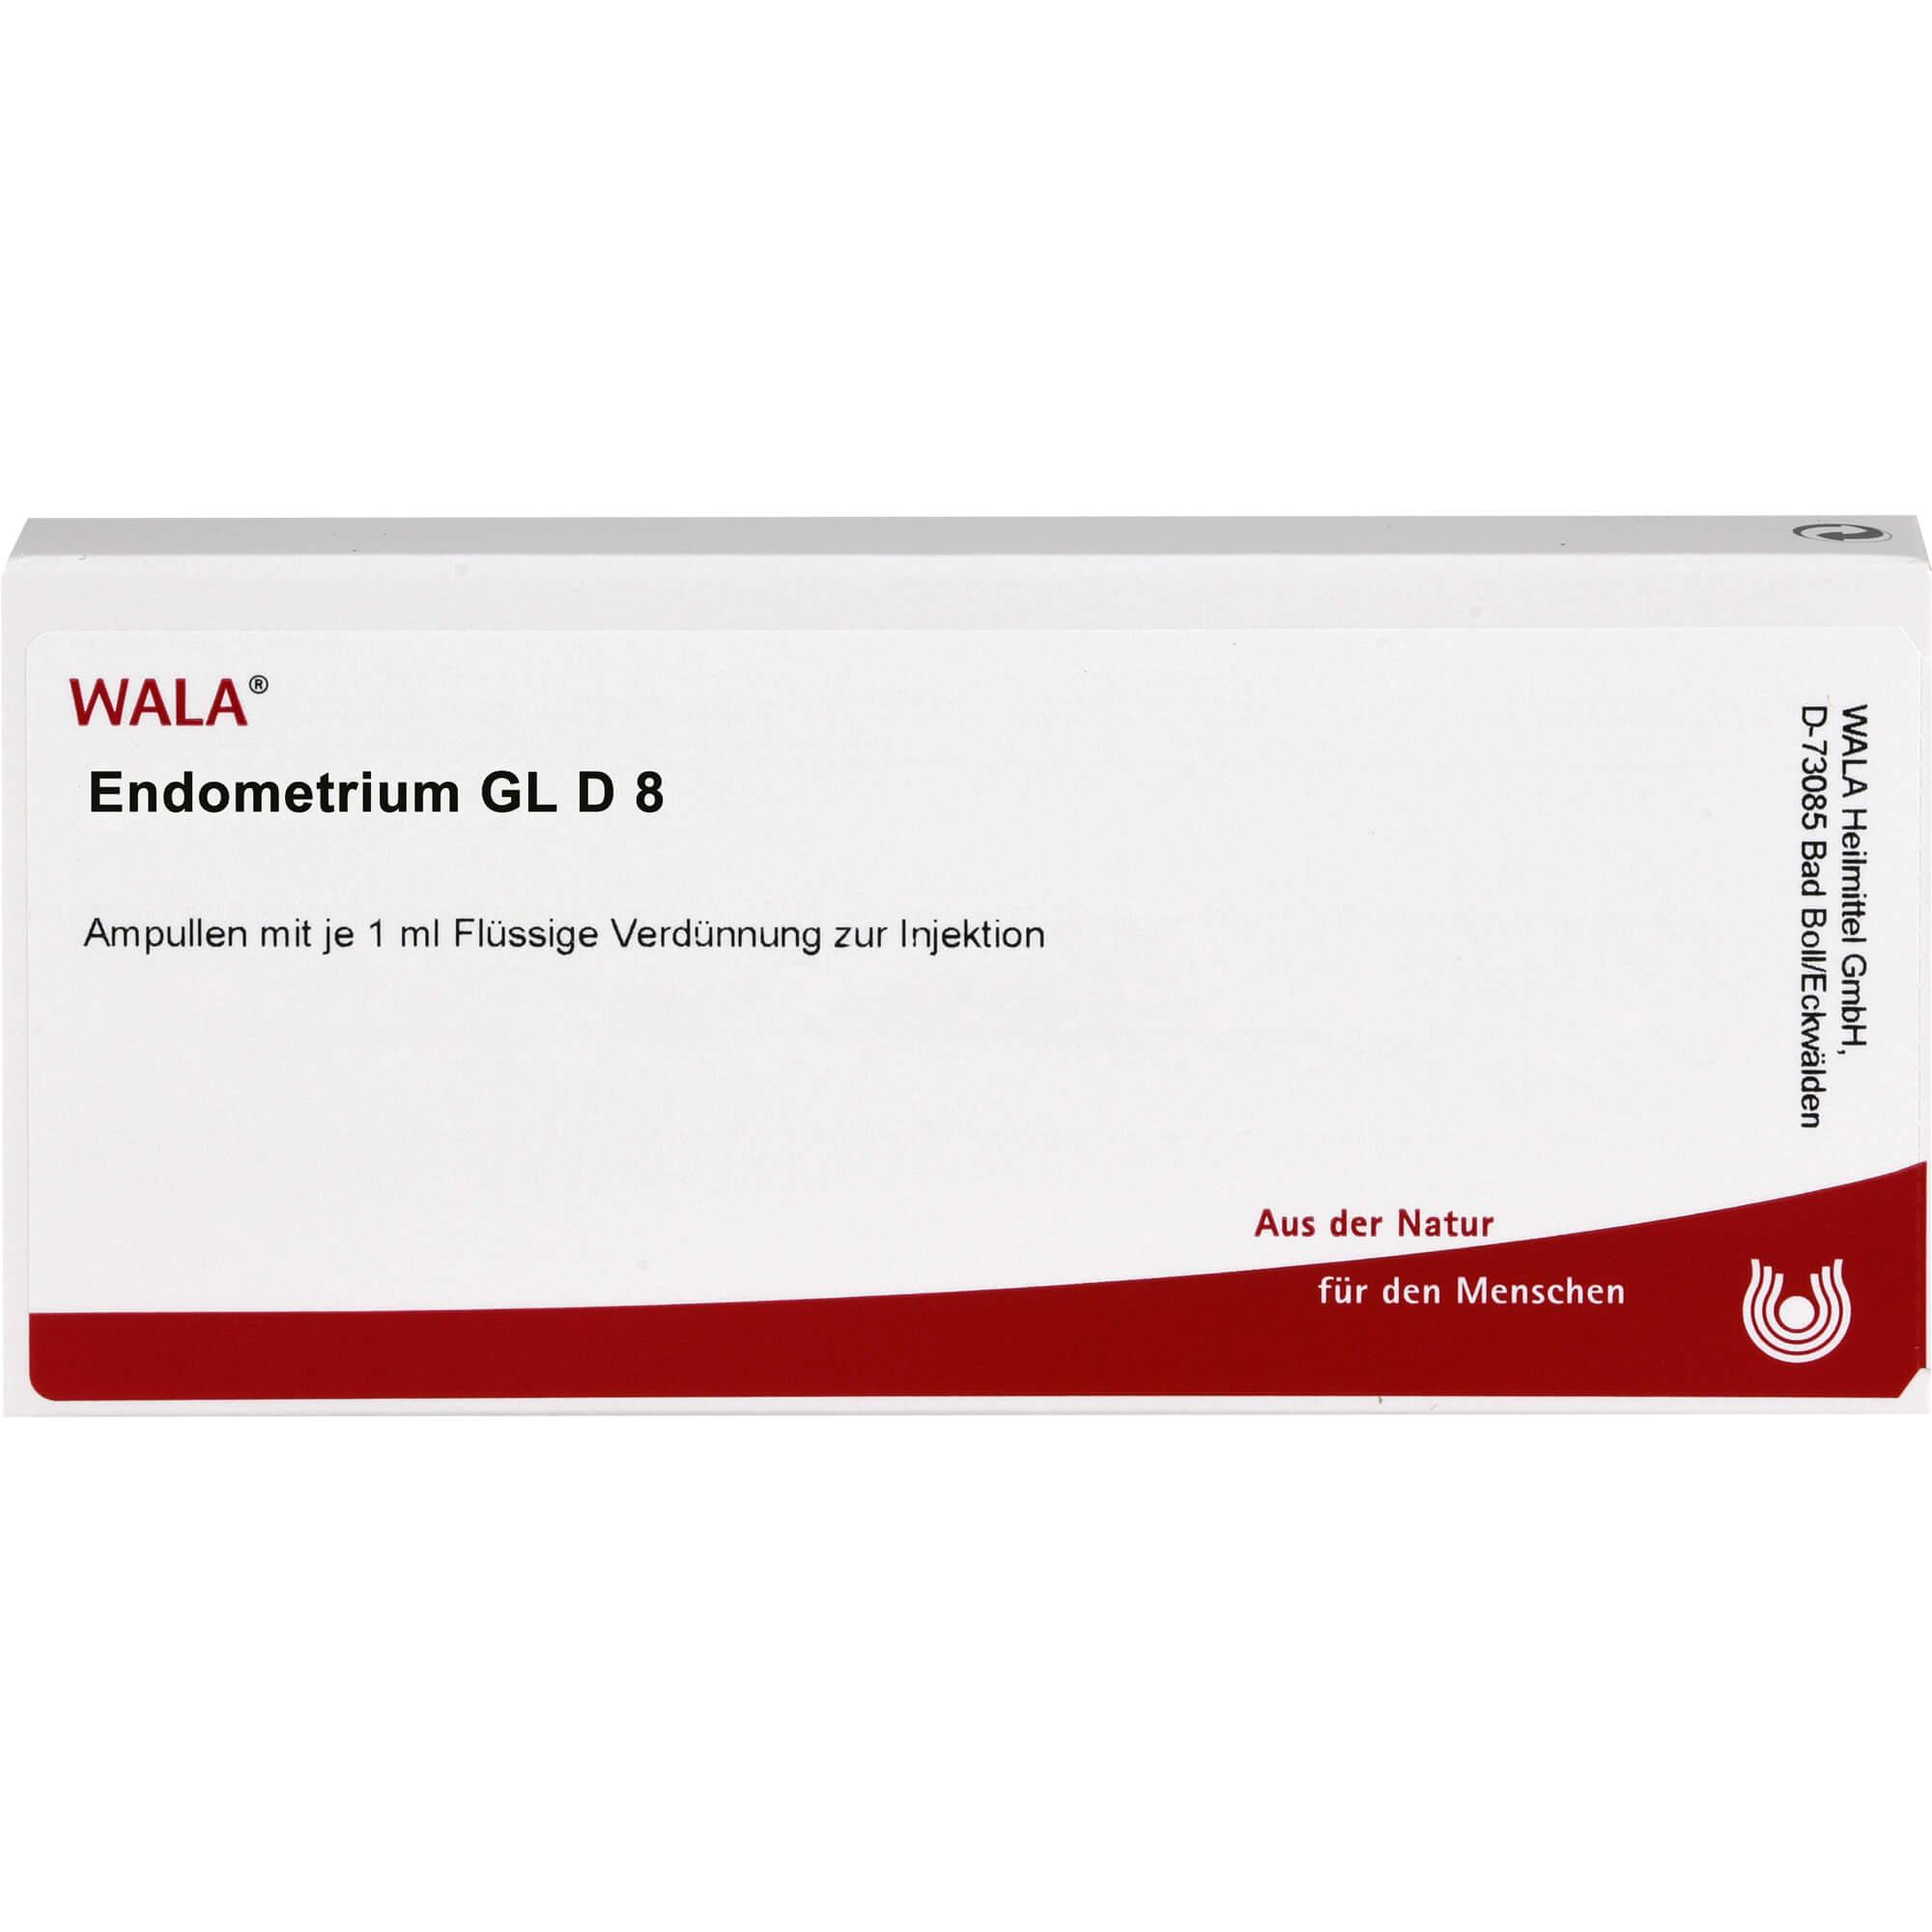 ENDOMETRIUM-GL-D-8-Ampullen